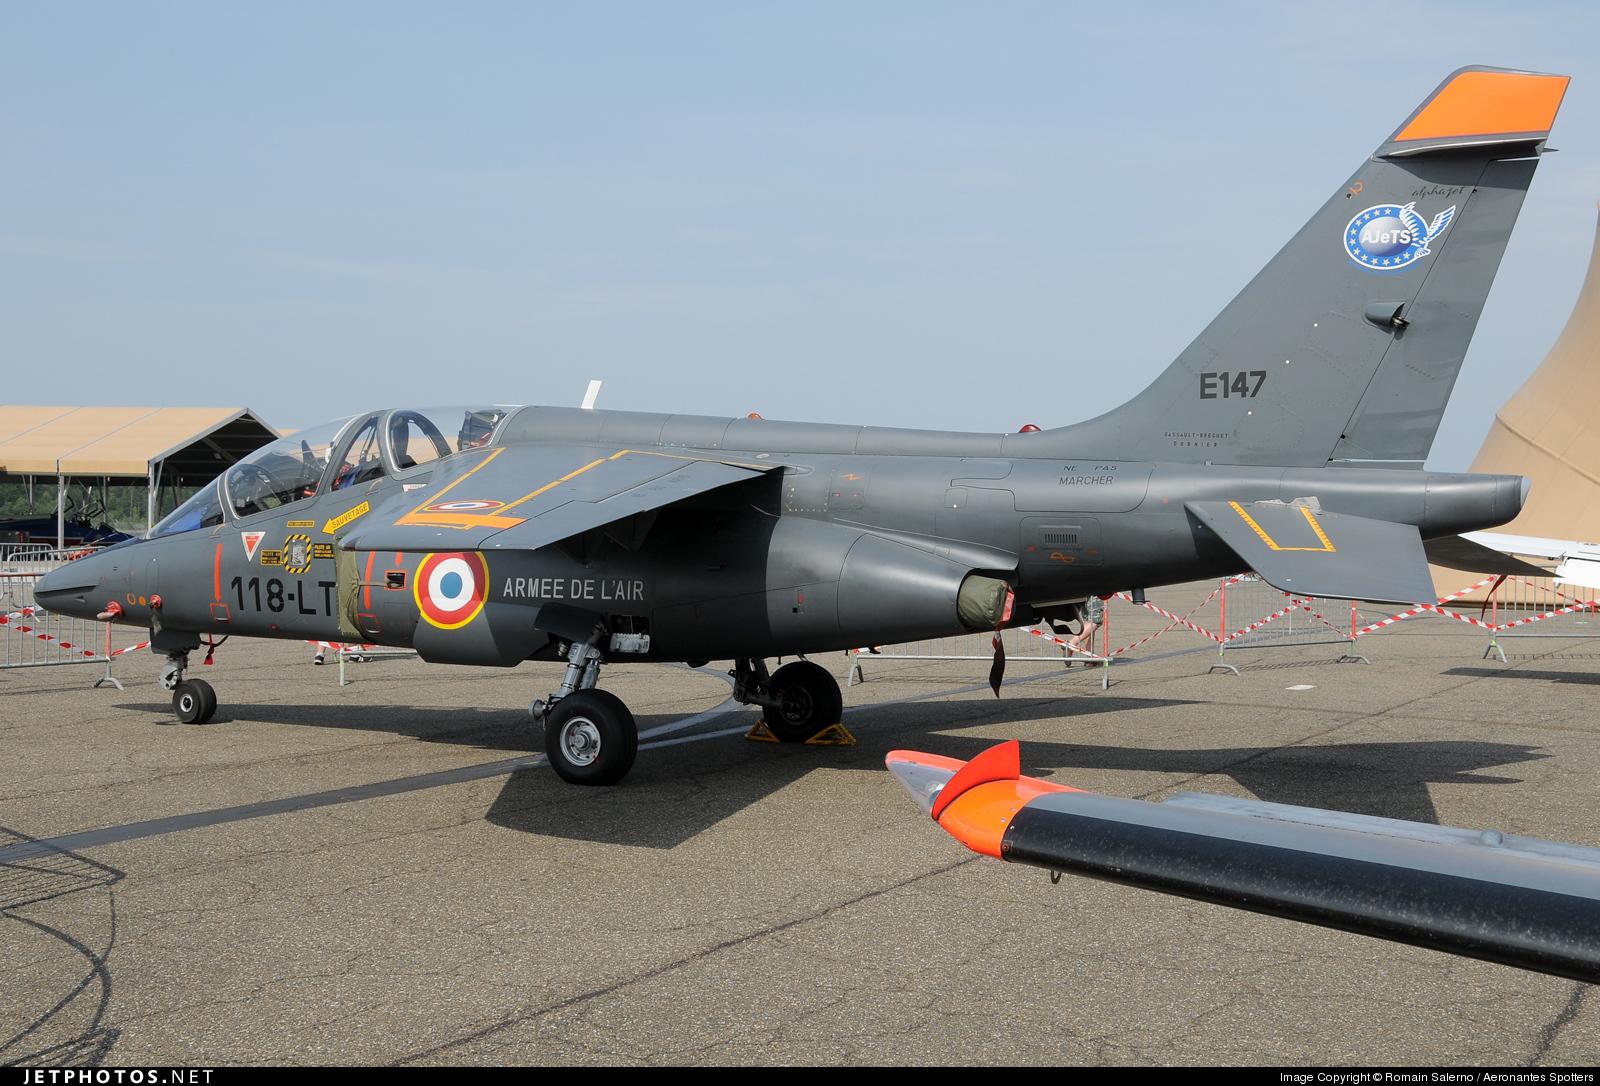 Risultati immagini per French Air Force Dassault-Breguet Alpha Jet E (E147)